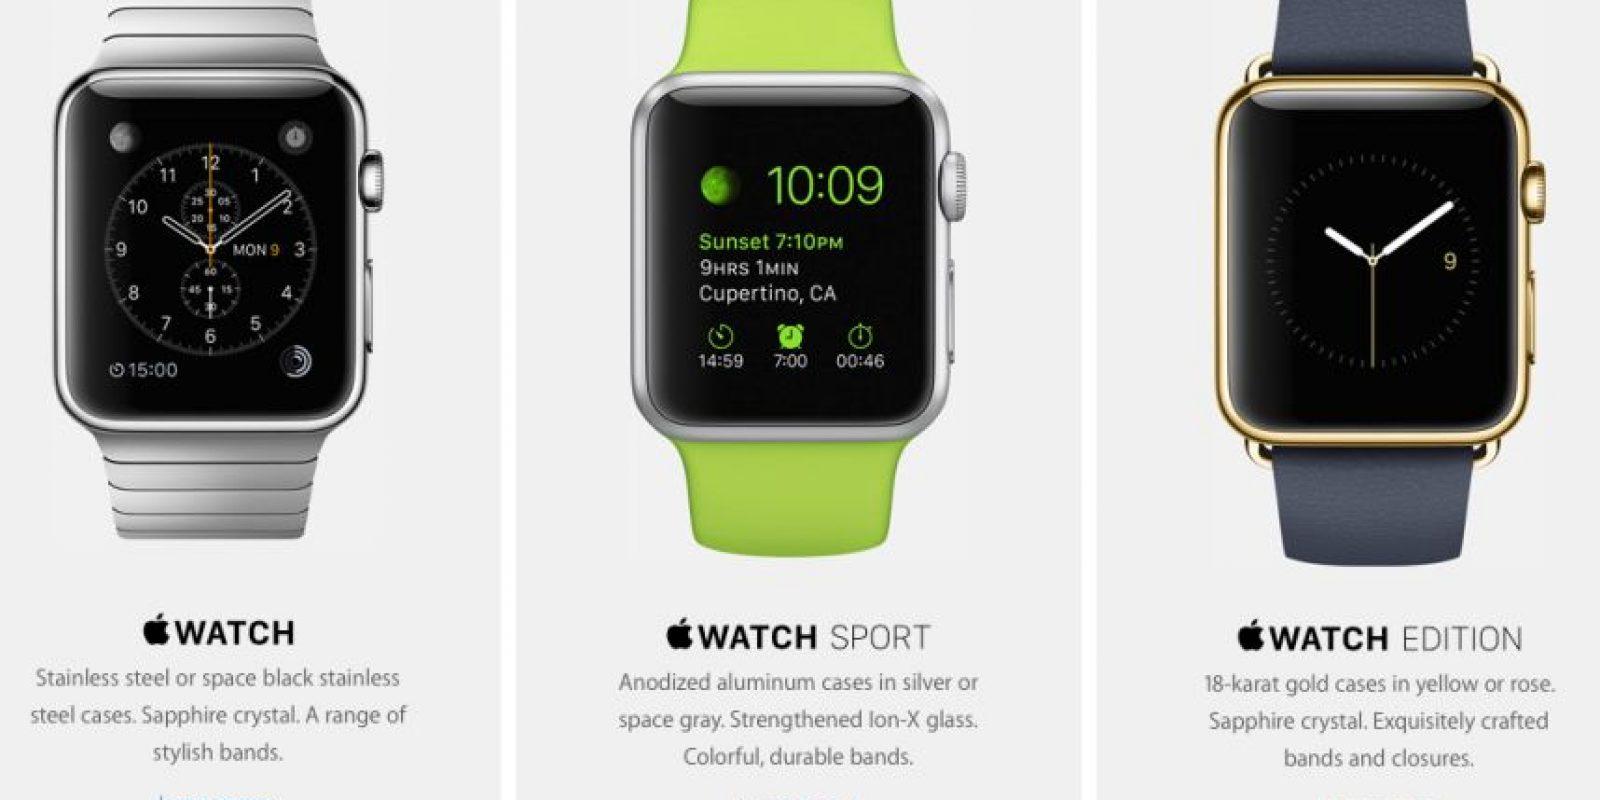 Se divide en tres colecciones diferentes: Apple Watch, Apple Watch Sport y Apple Watch Edition Foto:Apple